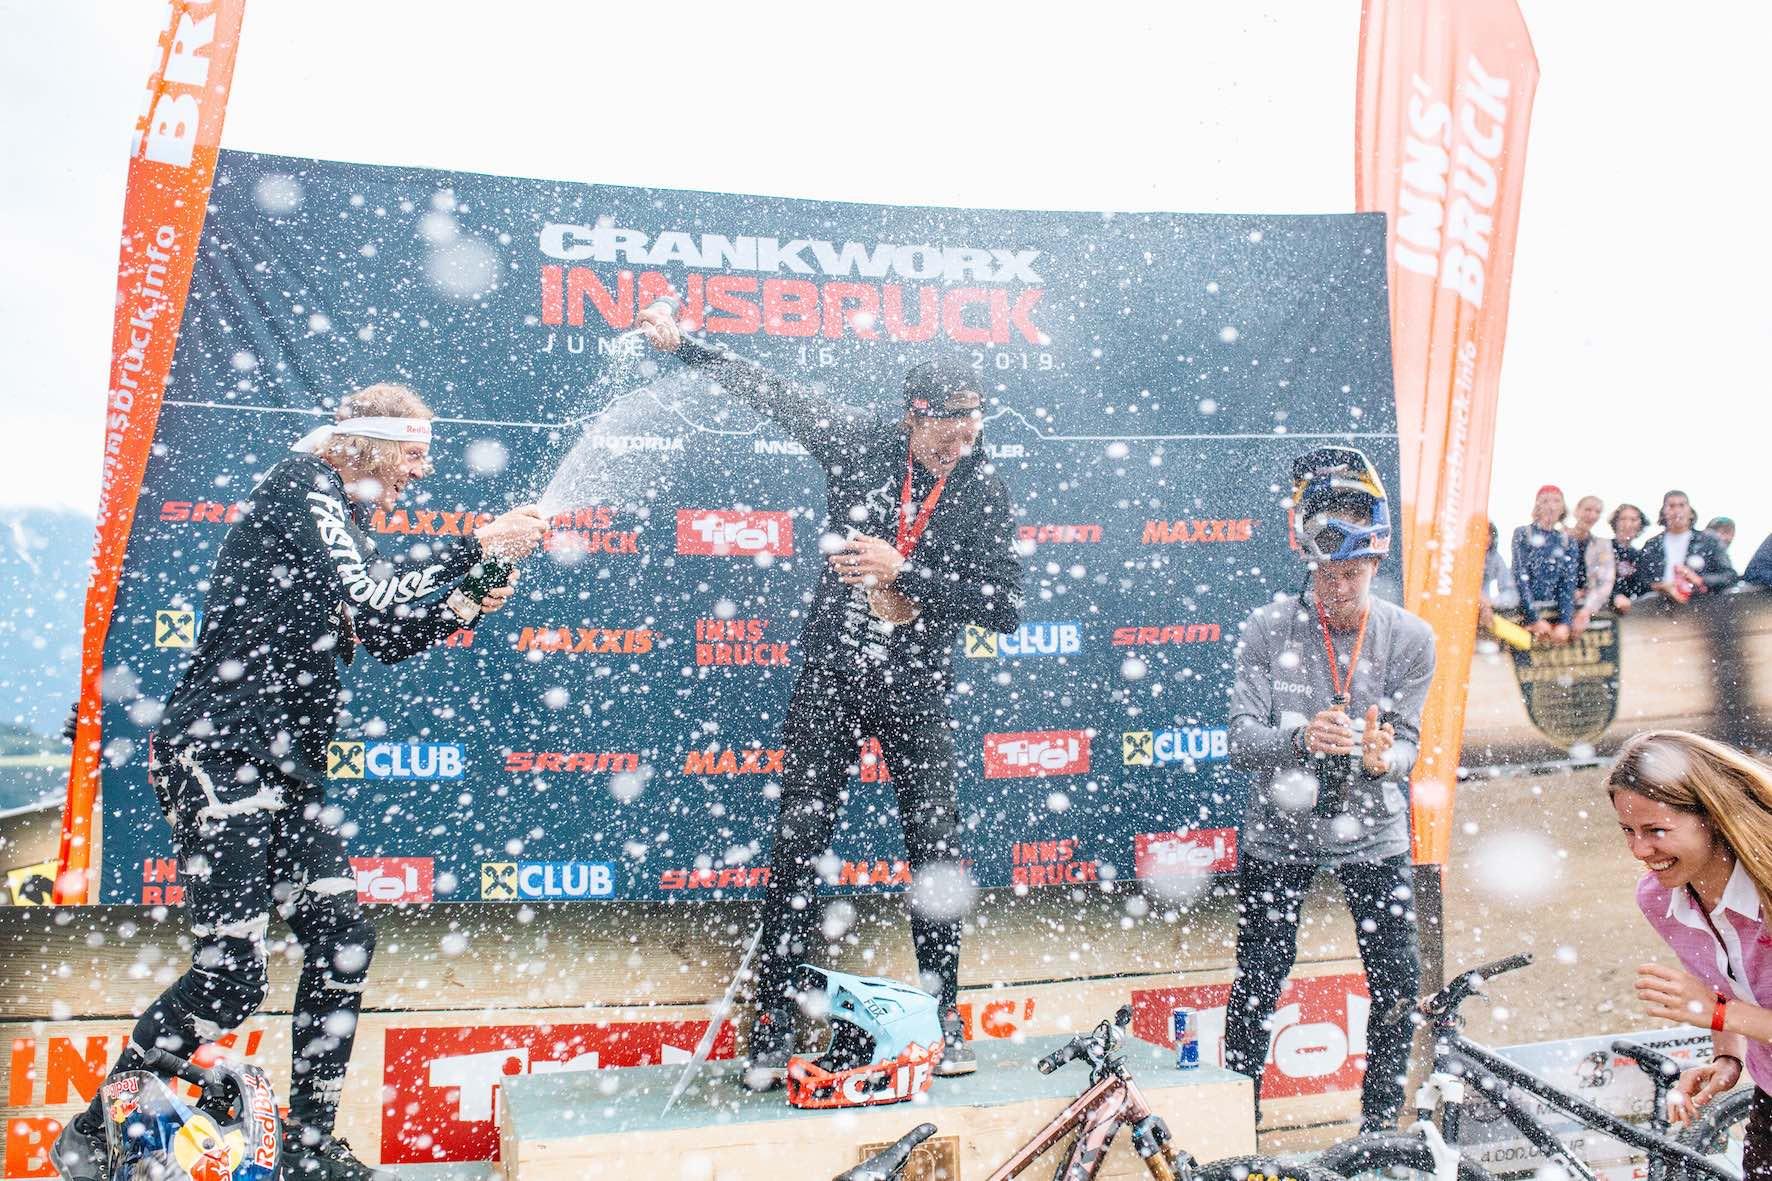 2019 Crankworx Innsbruck Slopestyle MTB Podium